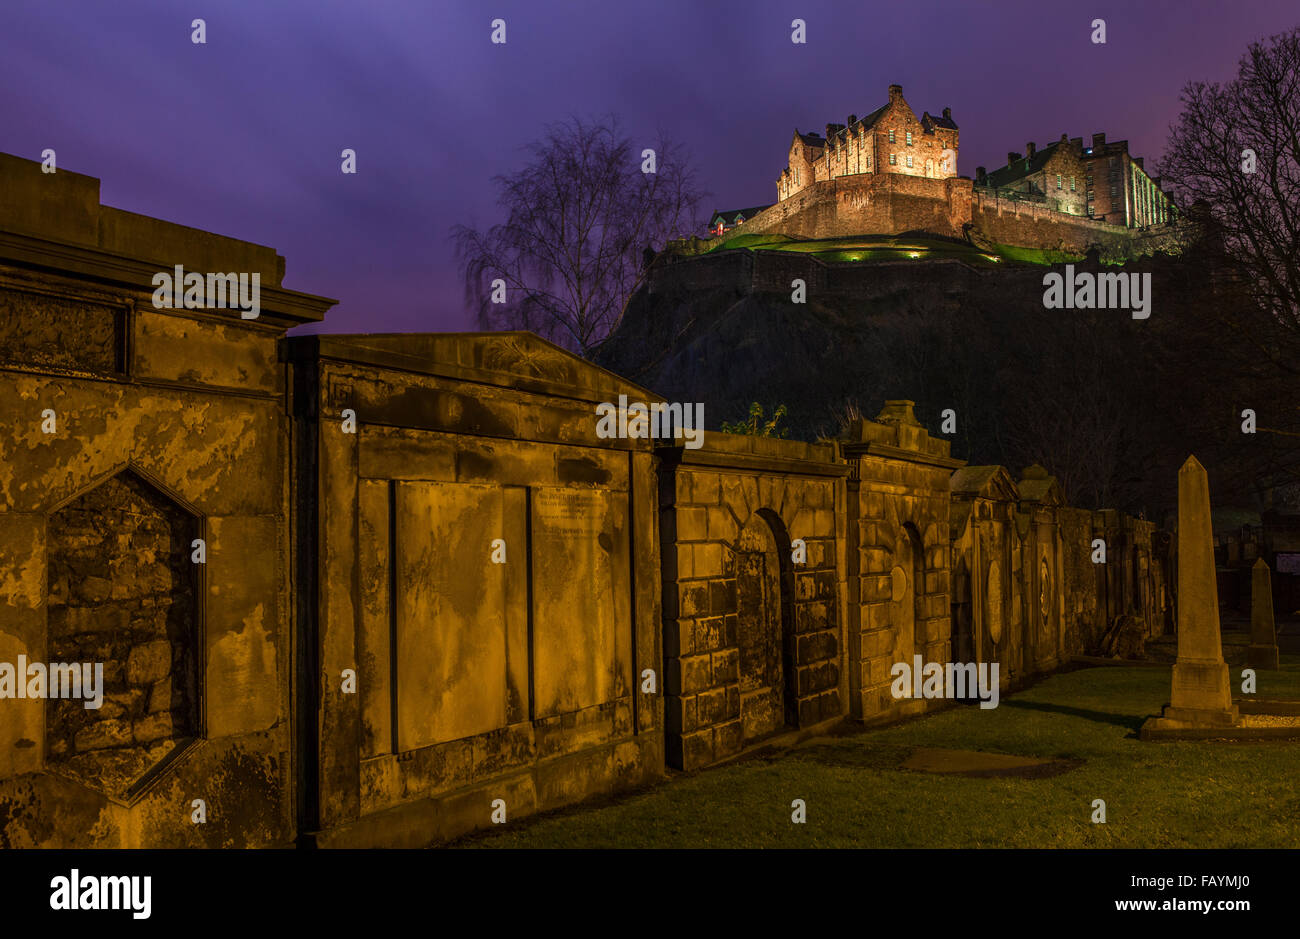 A stunning view of Edinburgh Castle from a Churchyard, Scotland. Stock Photo